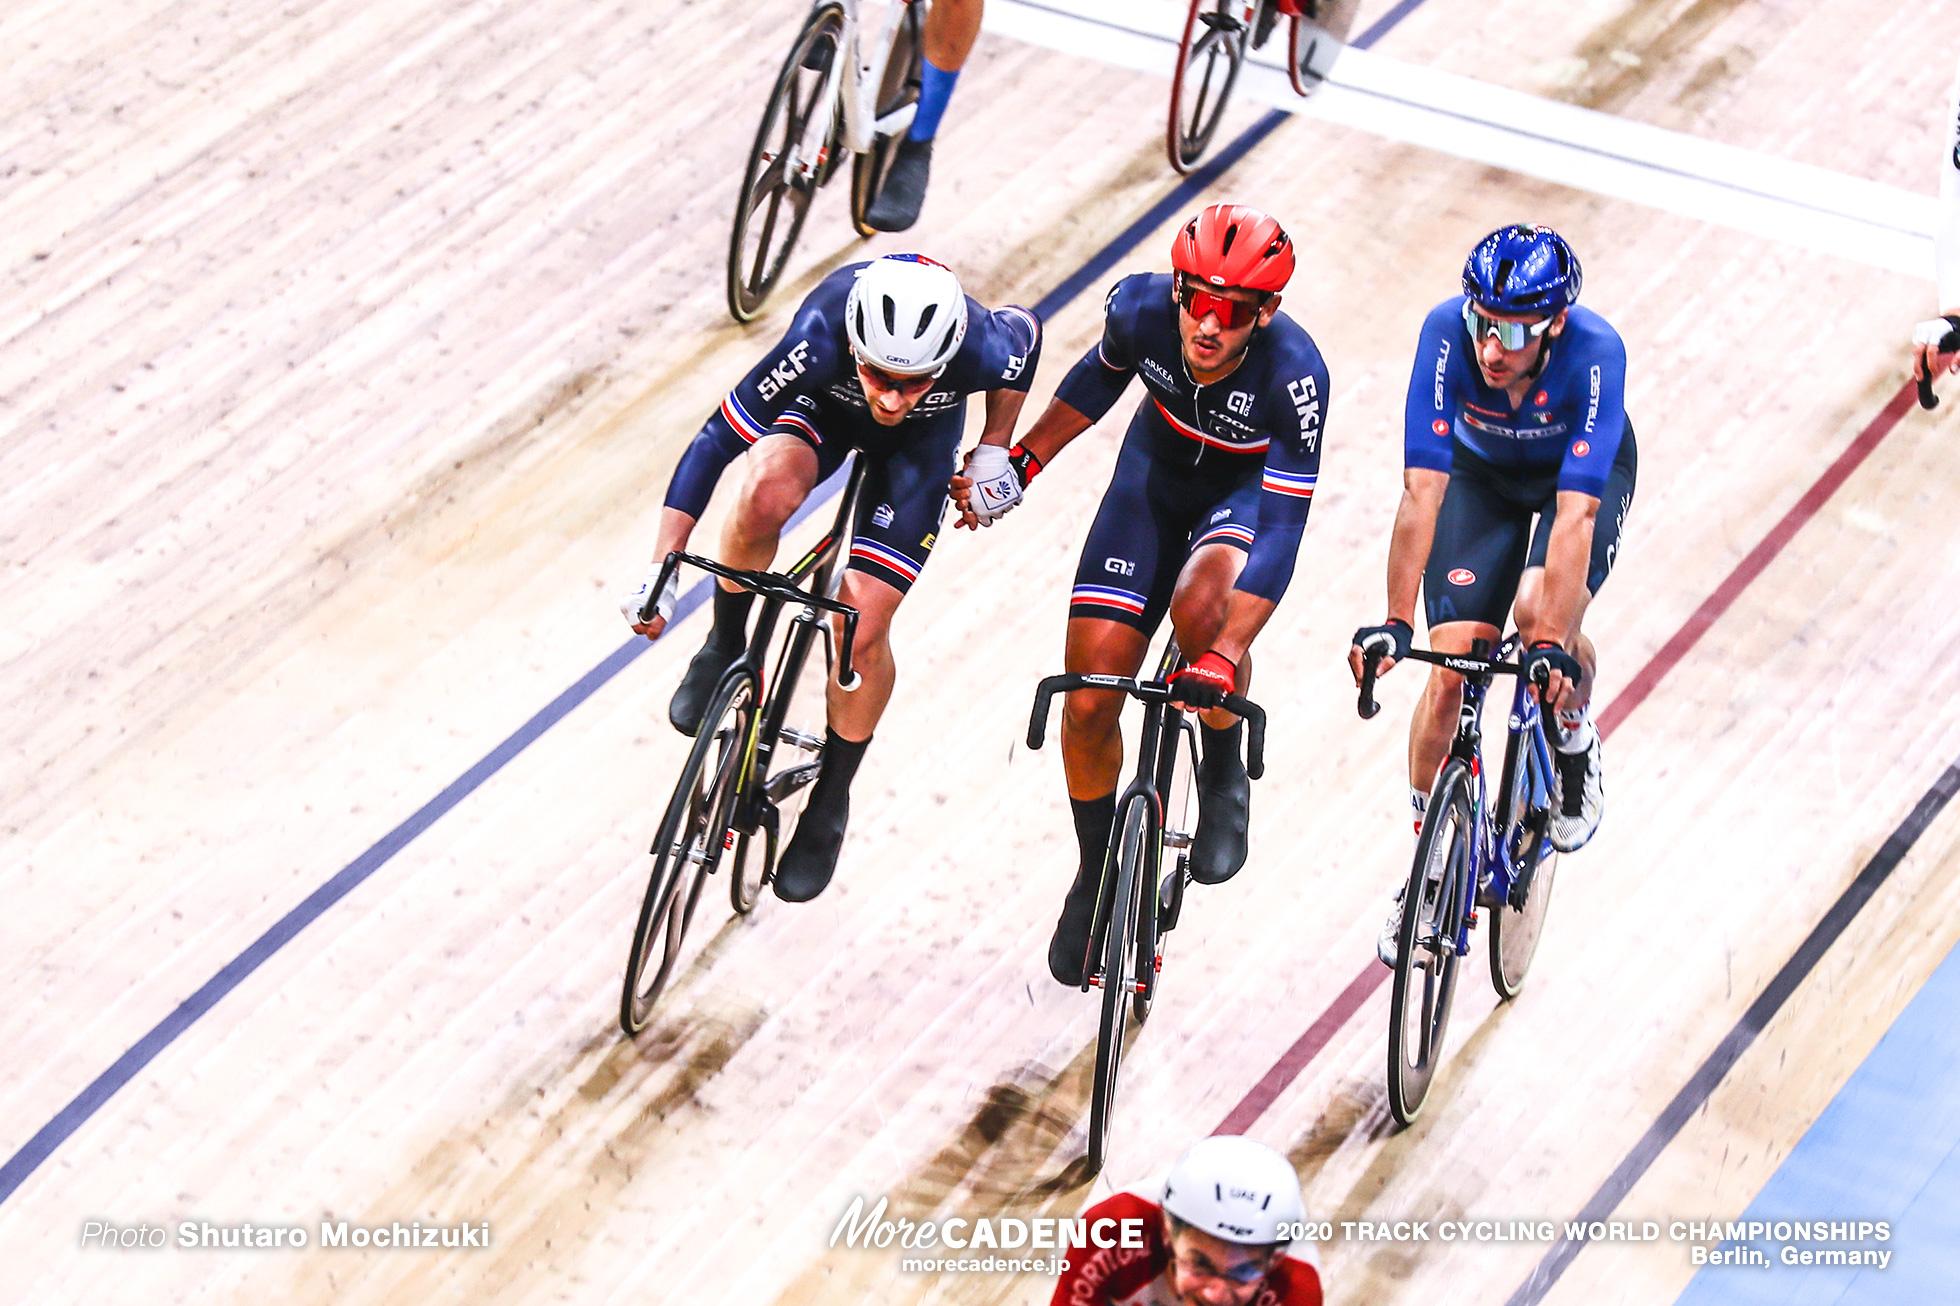 Men's Madison / 2020 Track Cycling World Championships, Benjamin Thomas ベンジャミン・トマ, Donavan Vincent Grondin ドナヴァン・グロンダン